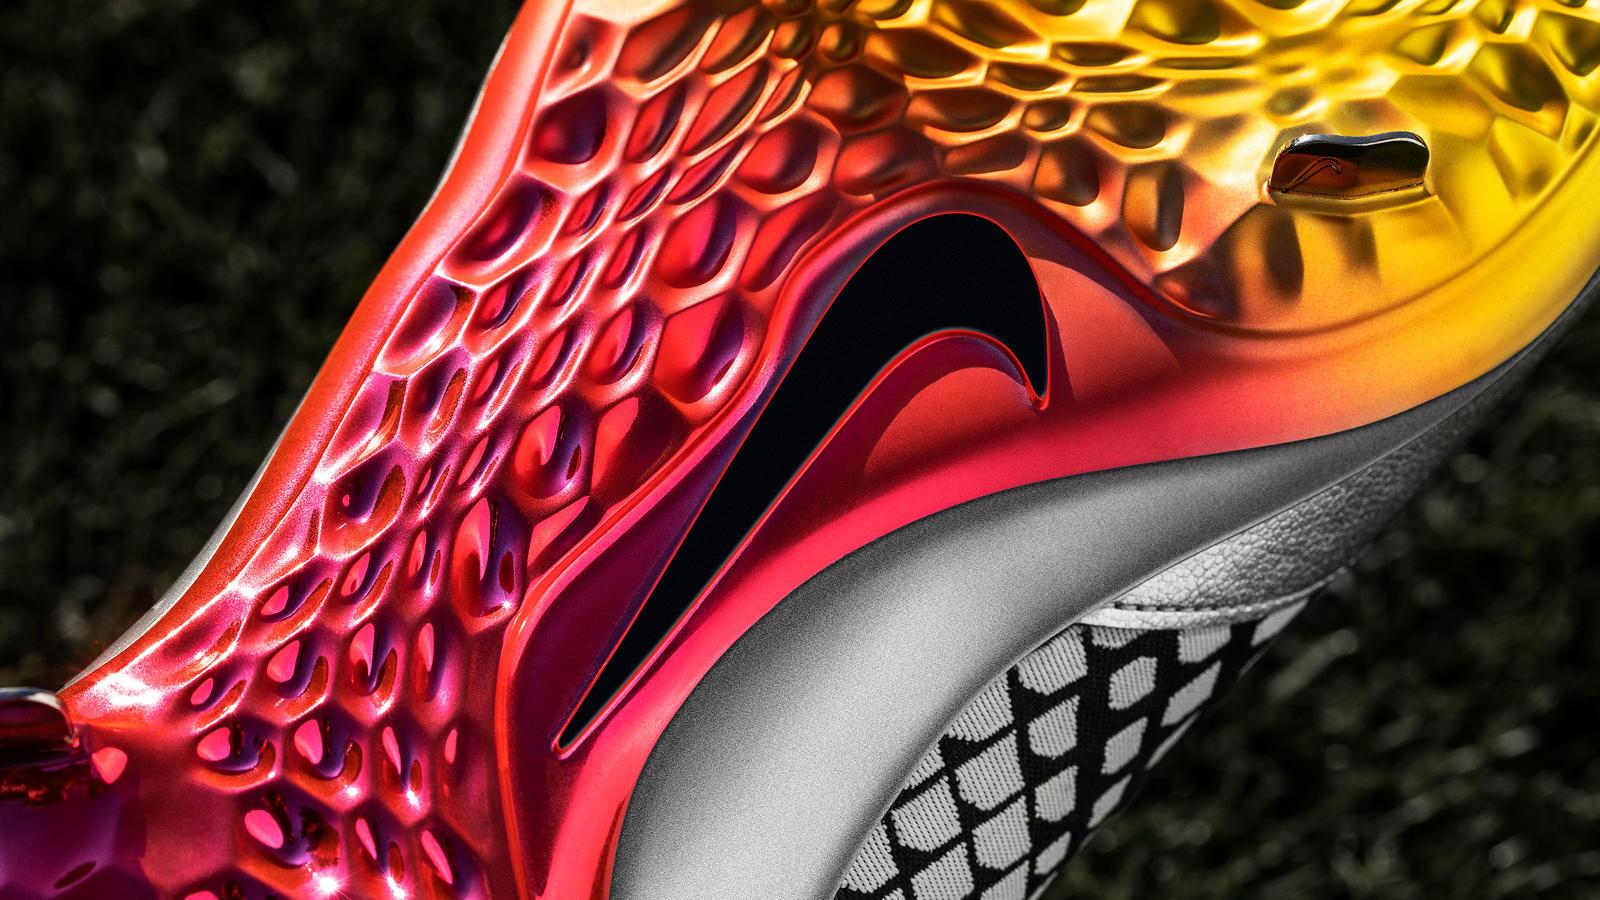 NikeNews_Fa19_BSBL_Trout6_NA_ASG_06_re_hd_1600.jpg